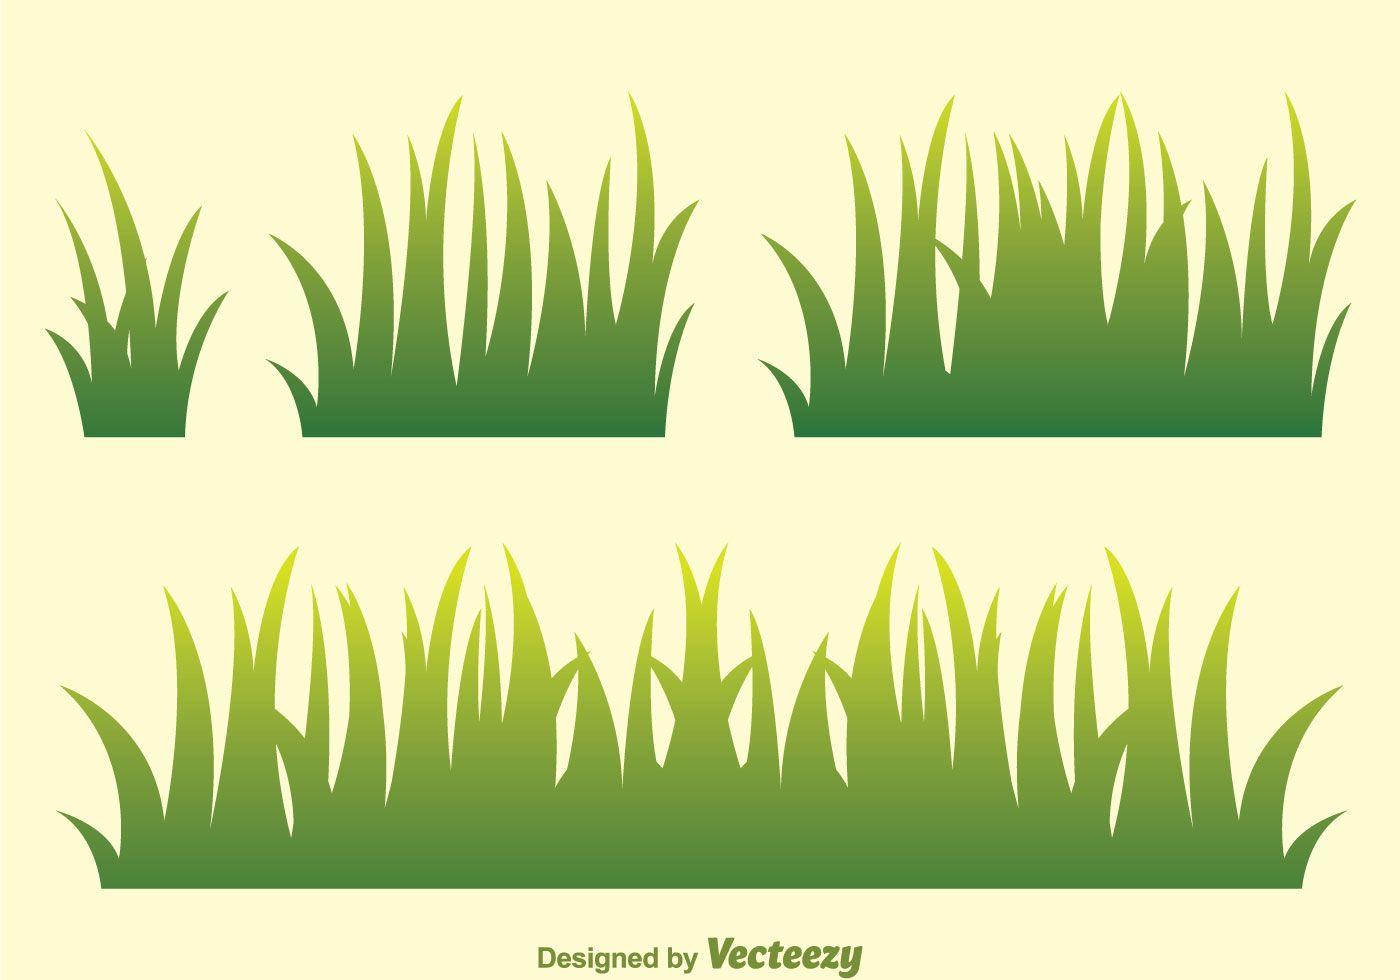 Green Grass Silhouette Ad Ad Spon Silhouette Grass Green Grass Silhouette Green Grass Business Card Template Psd